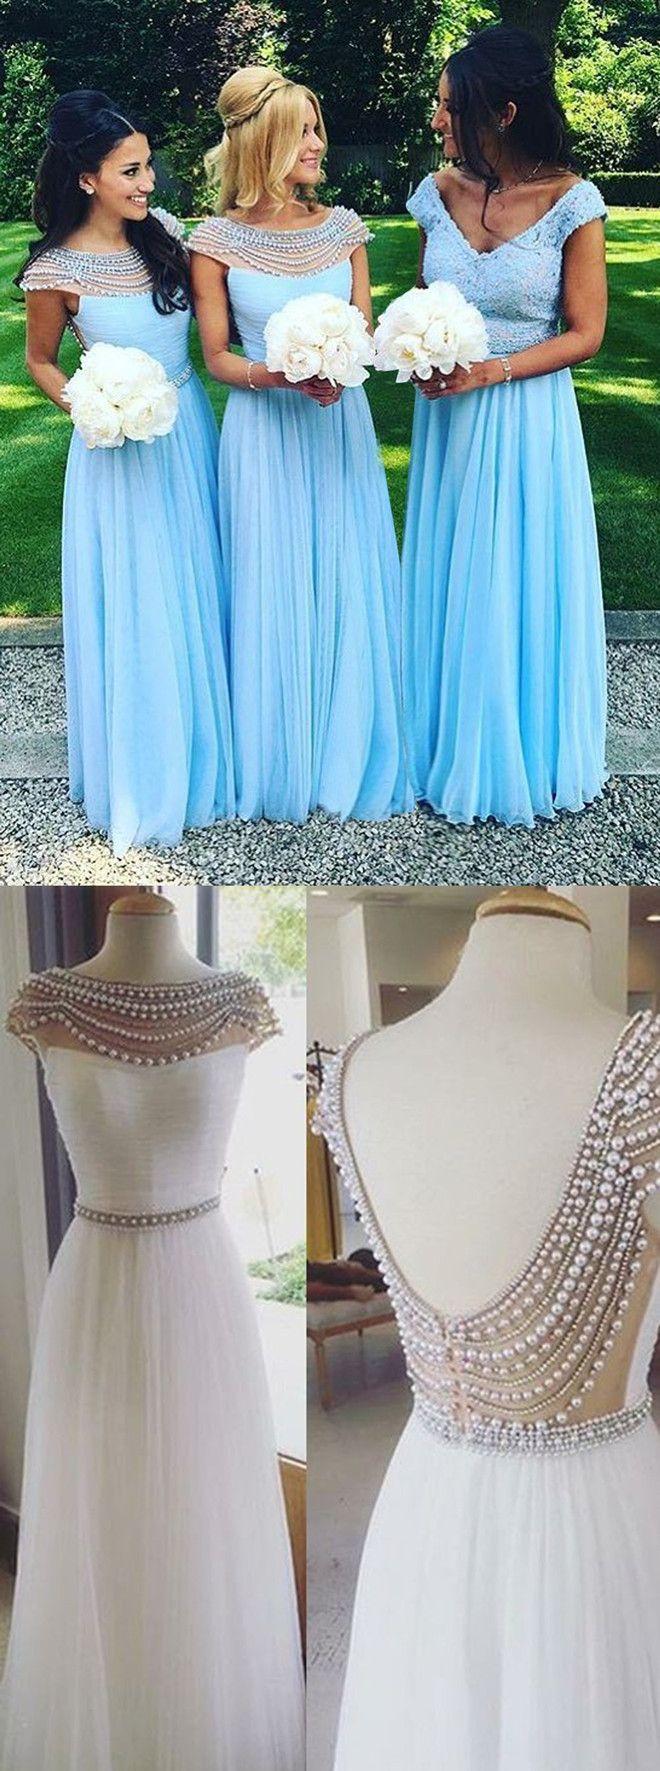 Long bridesmaid dresseslong prom dresseselegant bridesmaid dresses